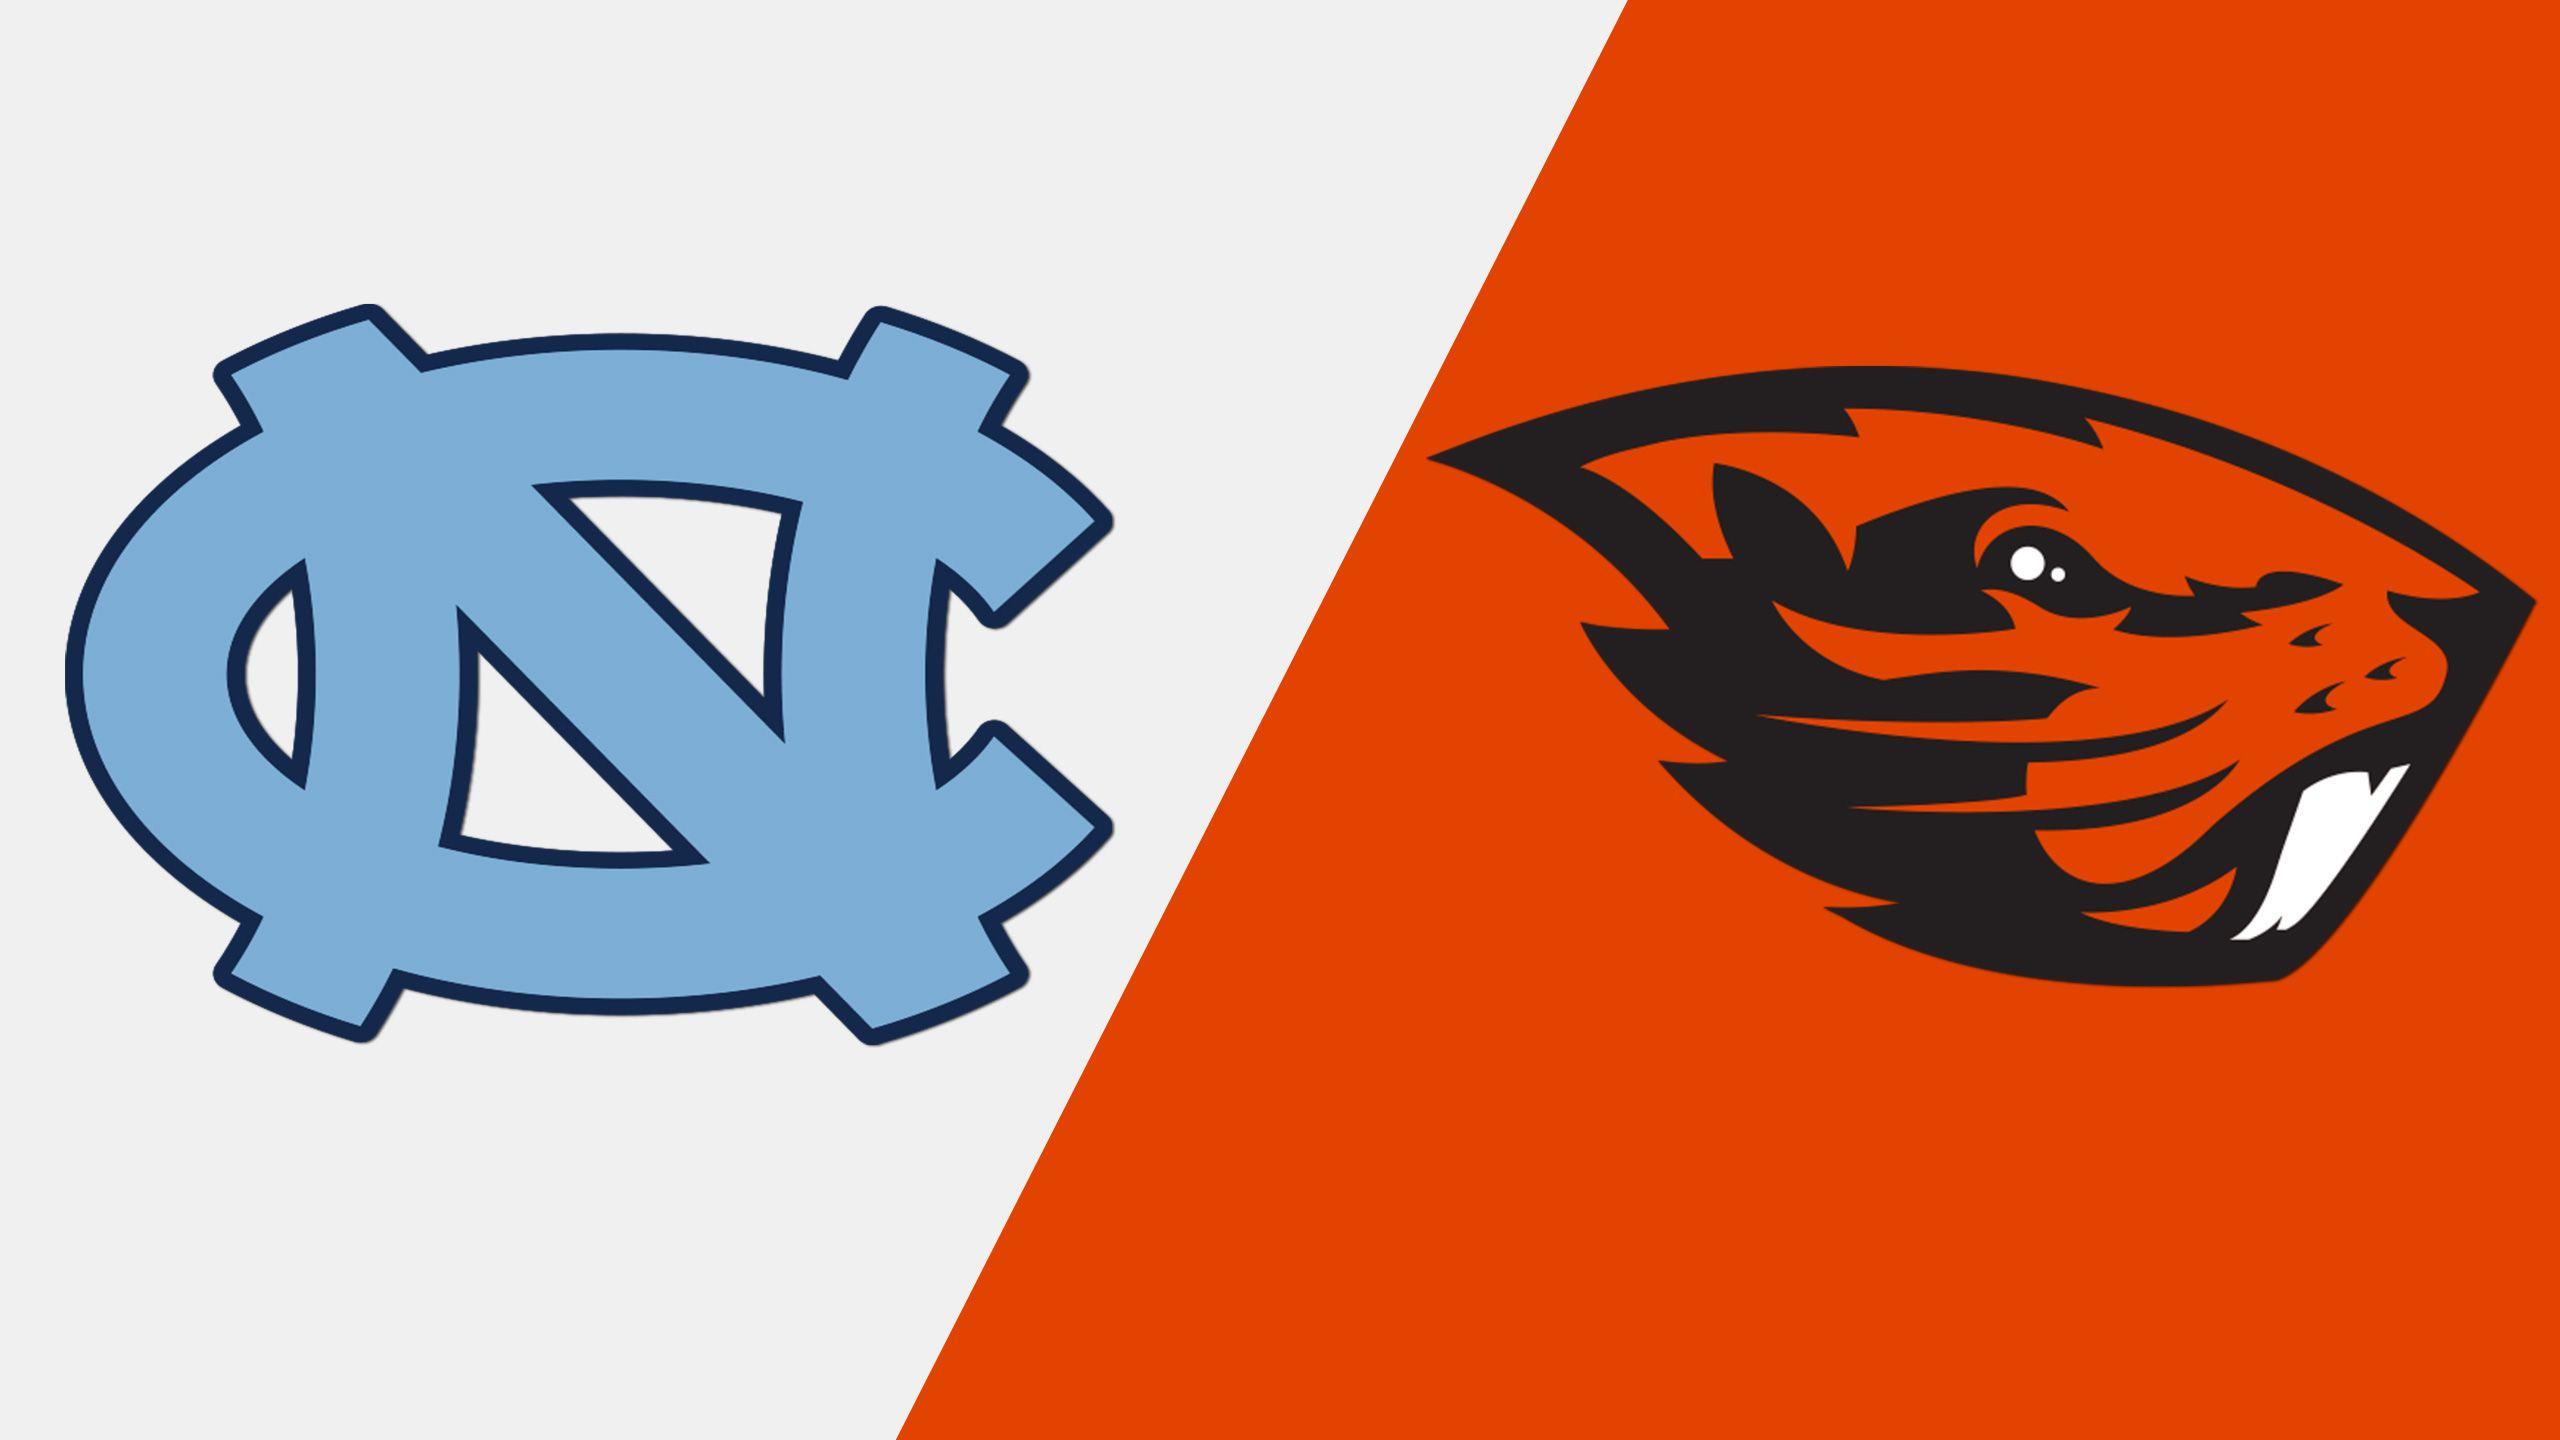 #6 North Carolina vs. #3 Oregon State (Game 1) (College World Series)